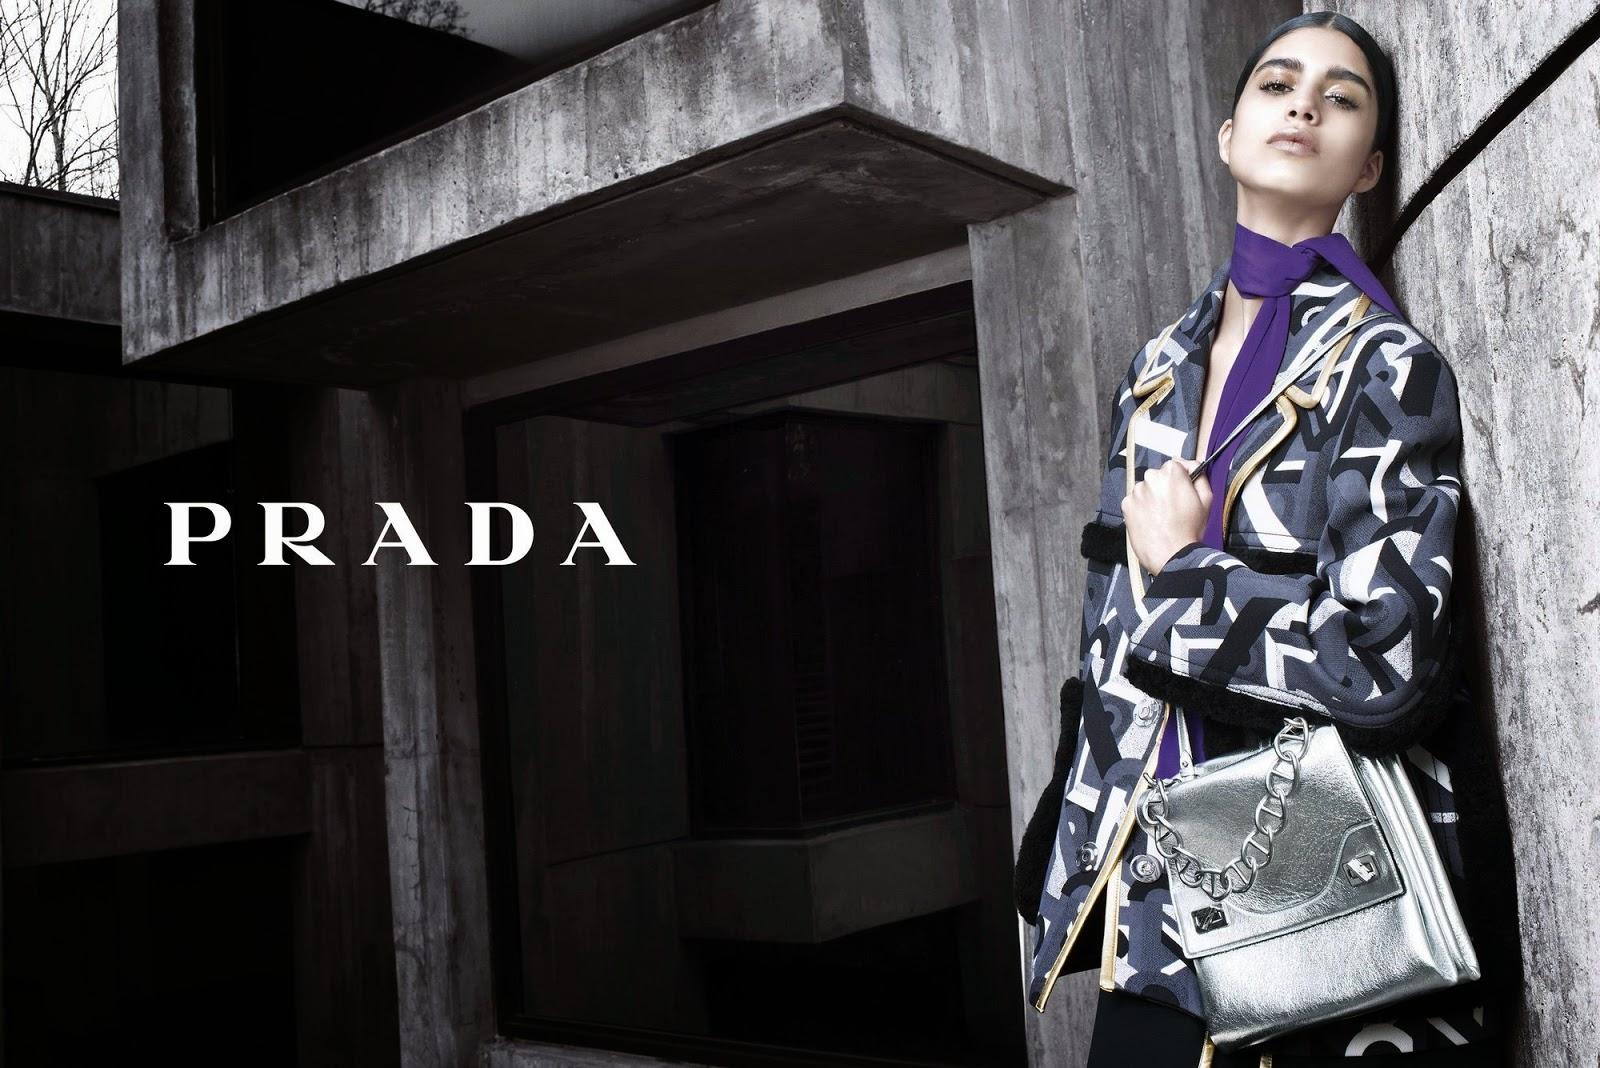 Fashion branding agency chicago SEO Company India, SEO Services India, PPC Services Agency